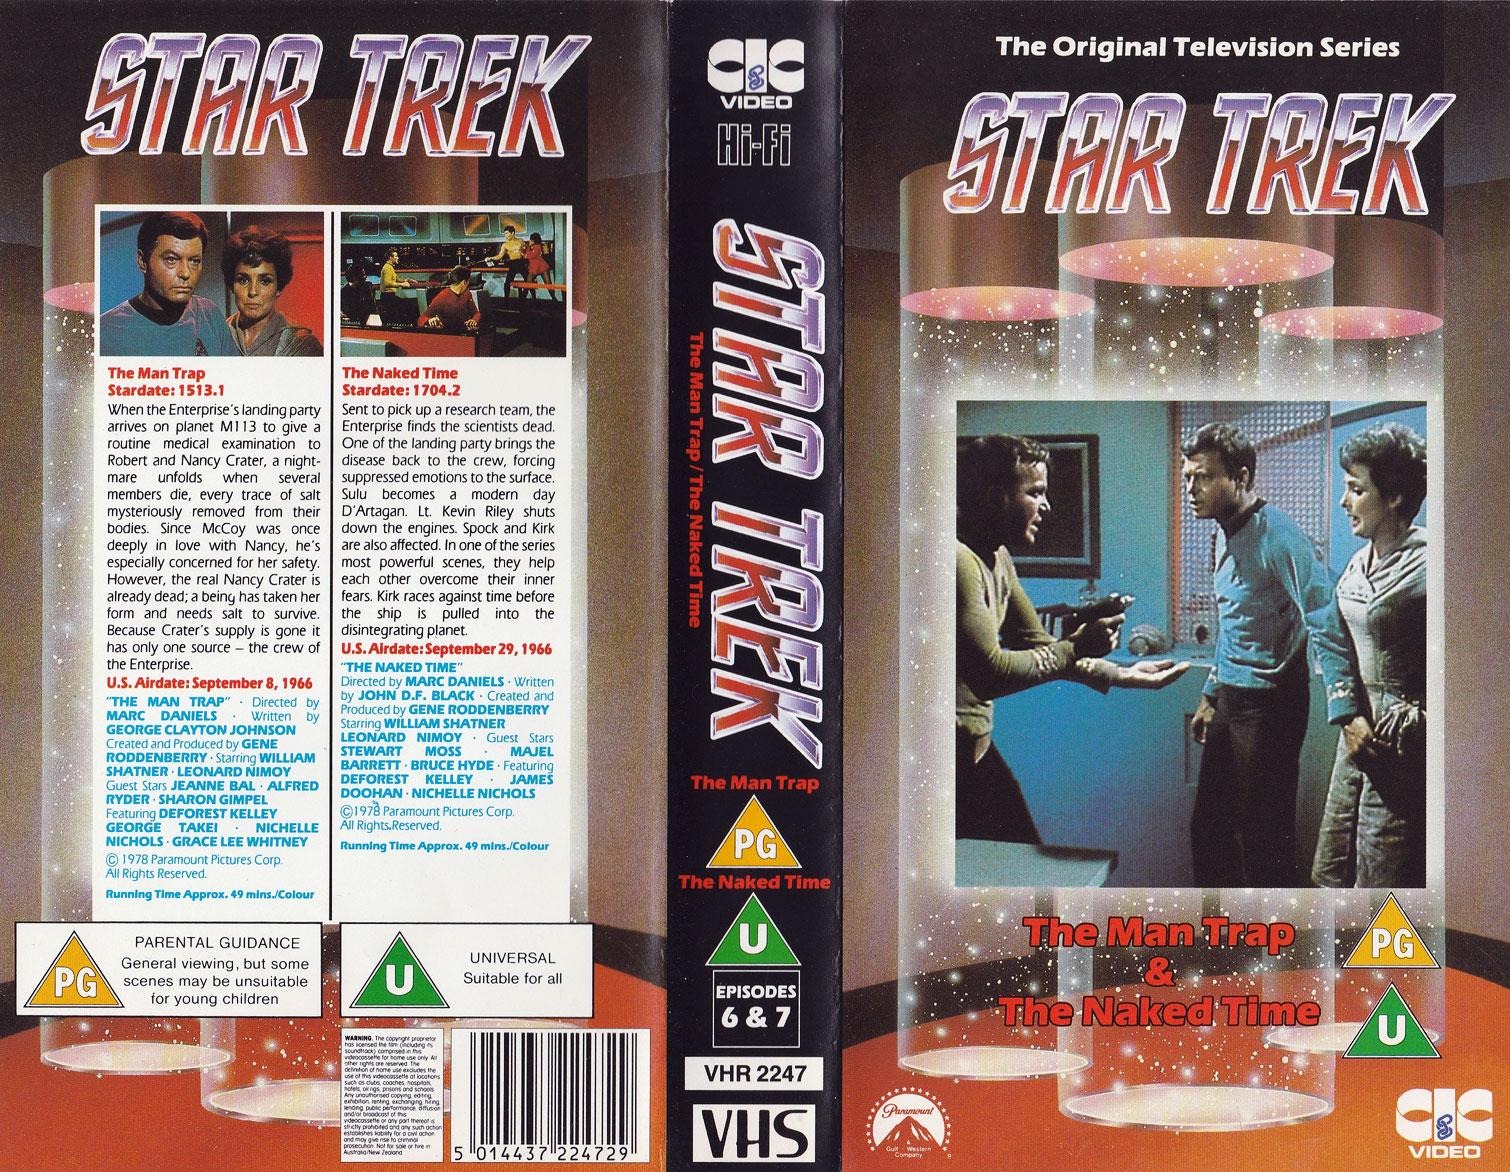 Star trek dating service